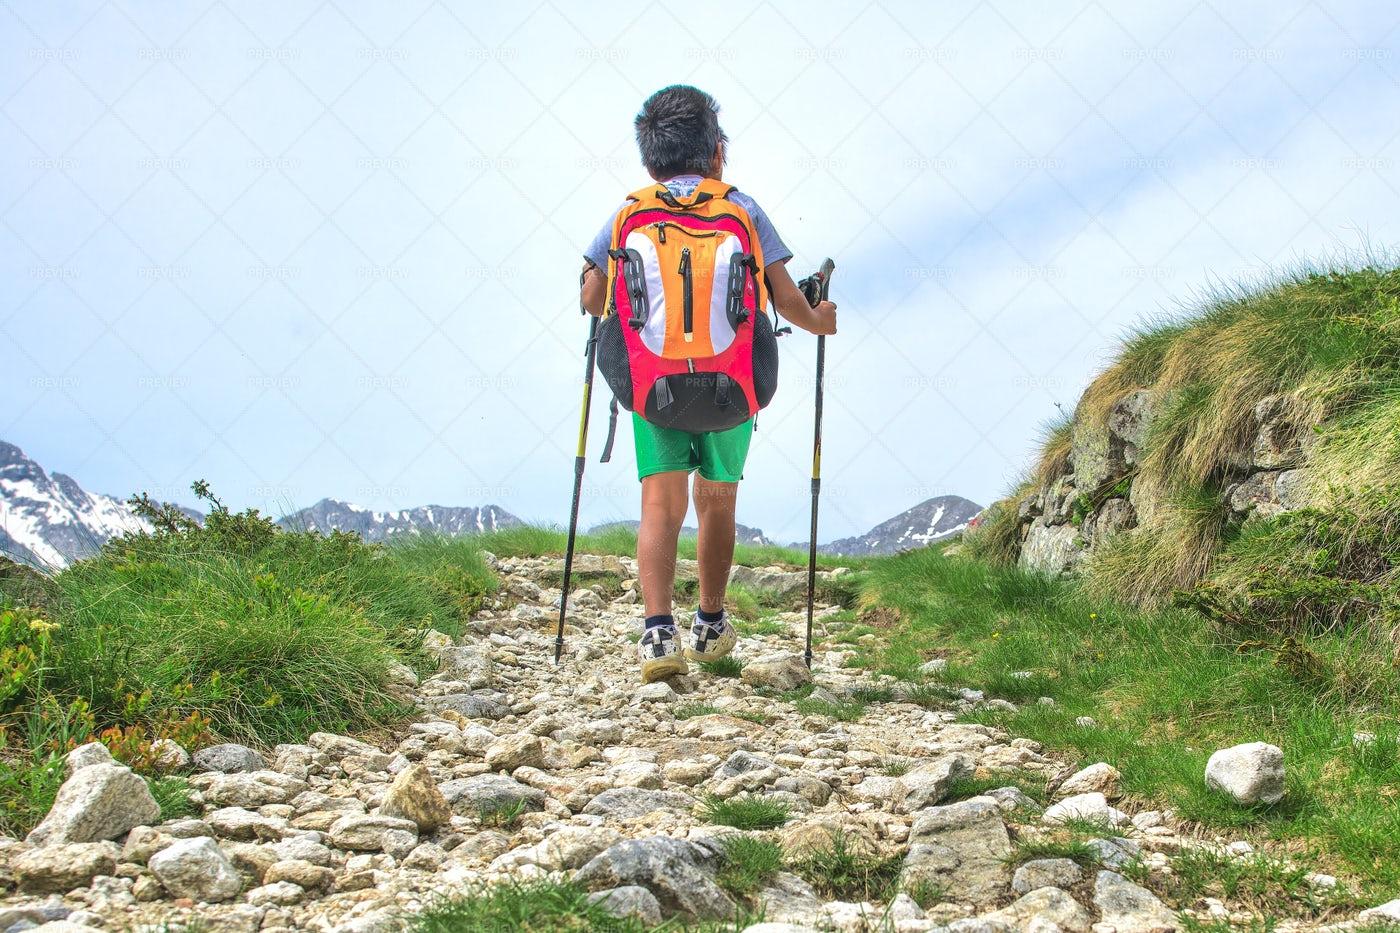 Boy Walking A Trail: Stock Photos